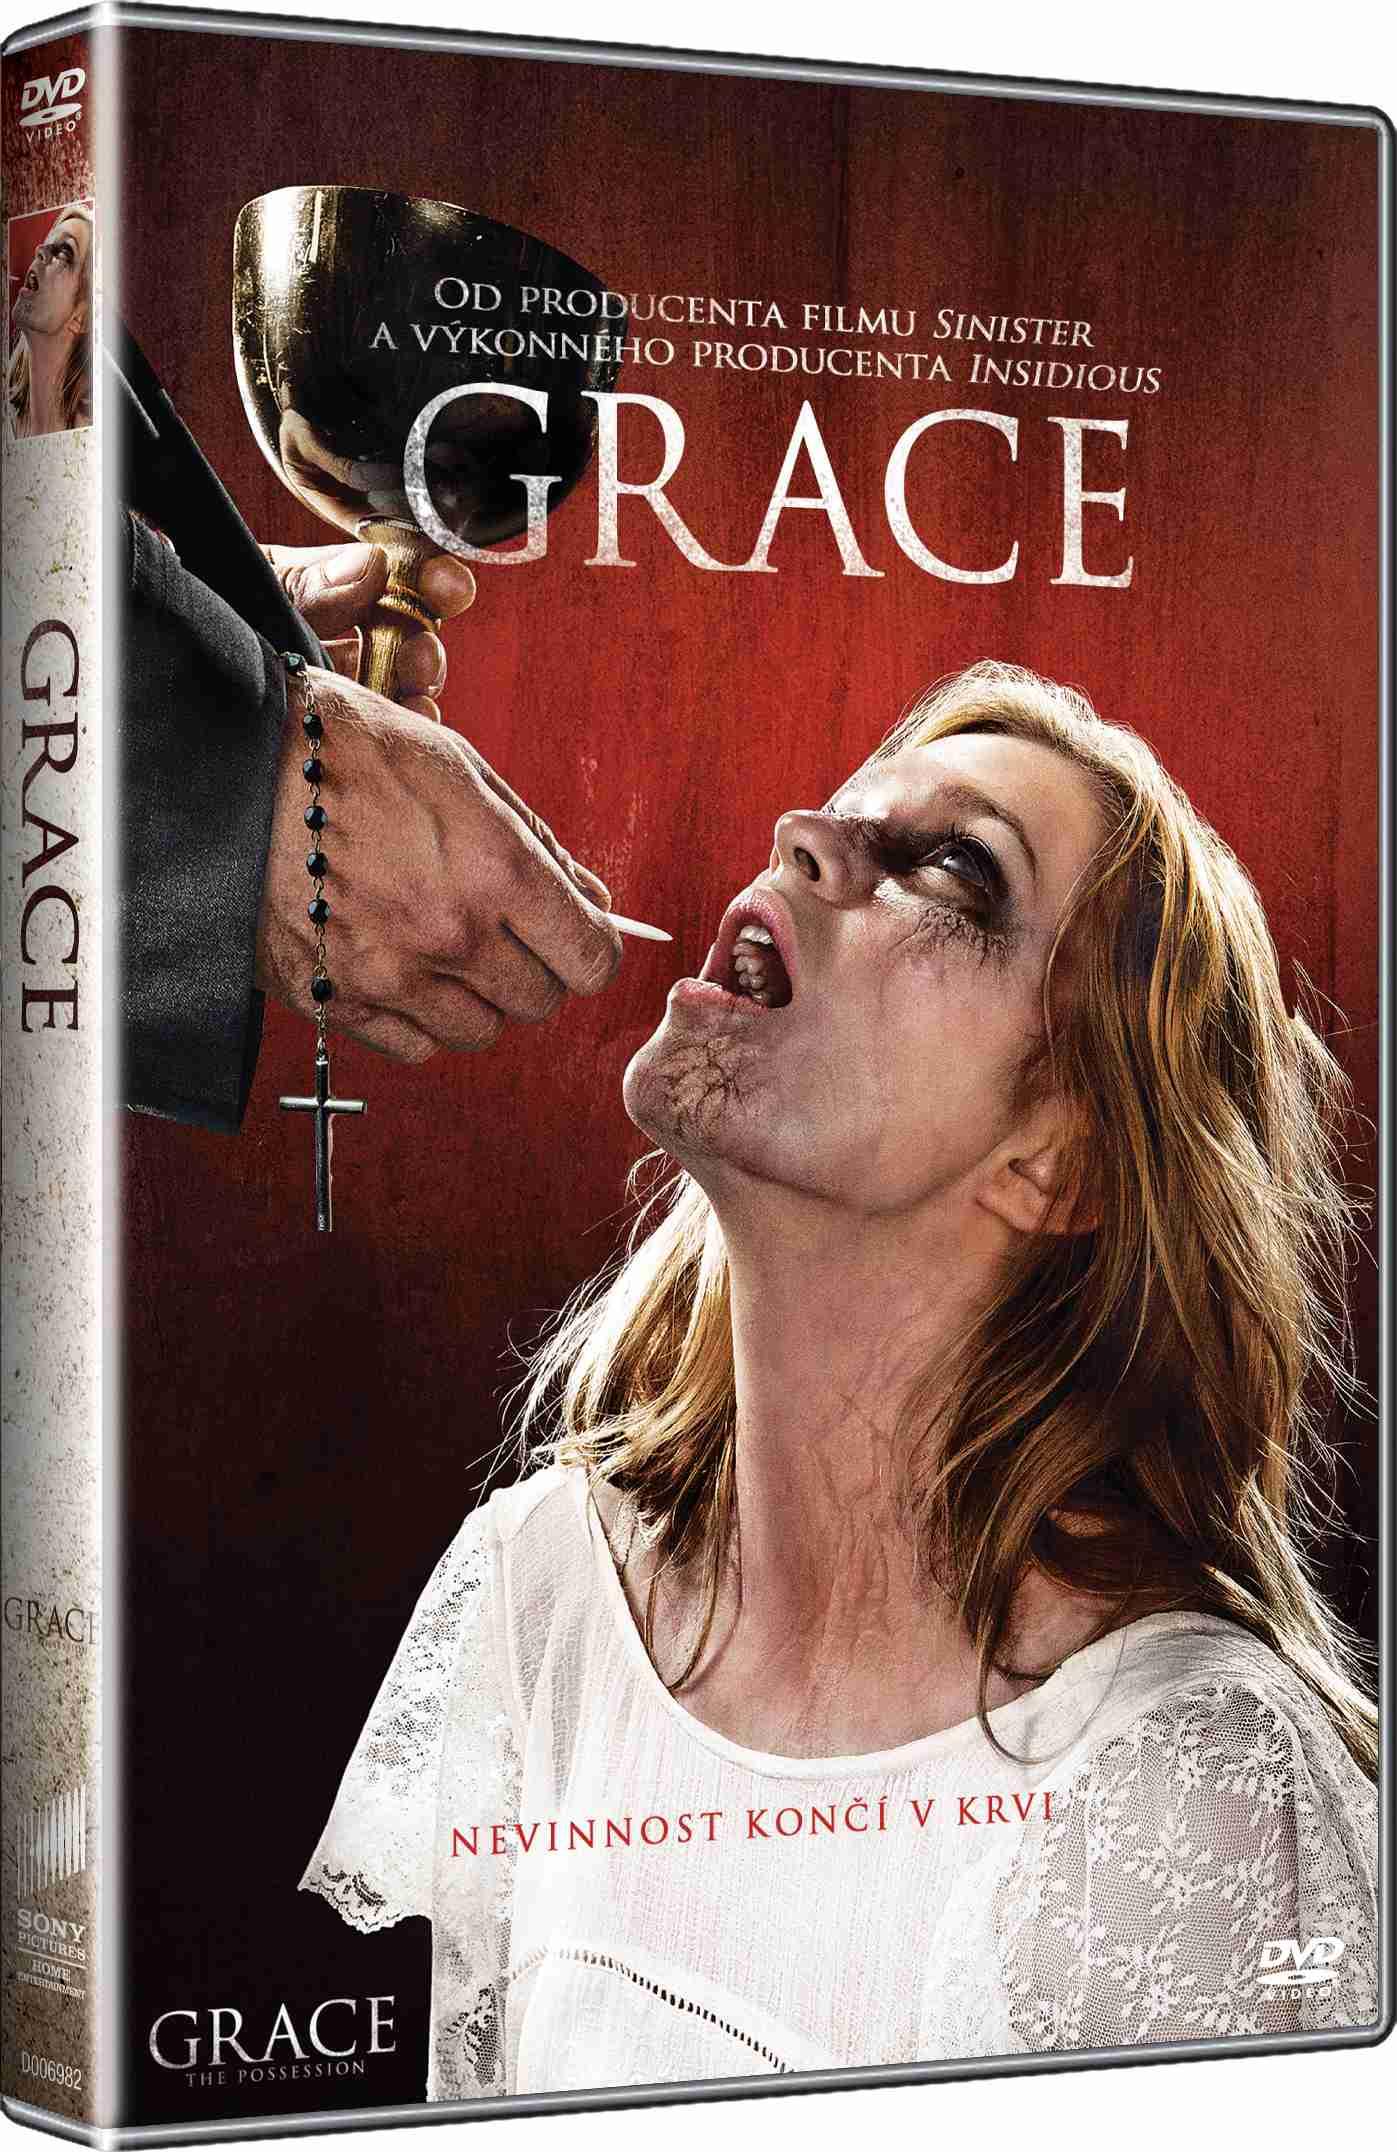 GRACE - DVD